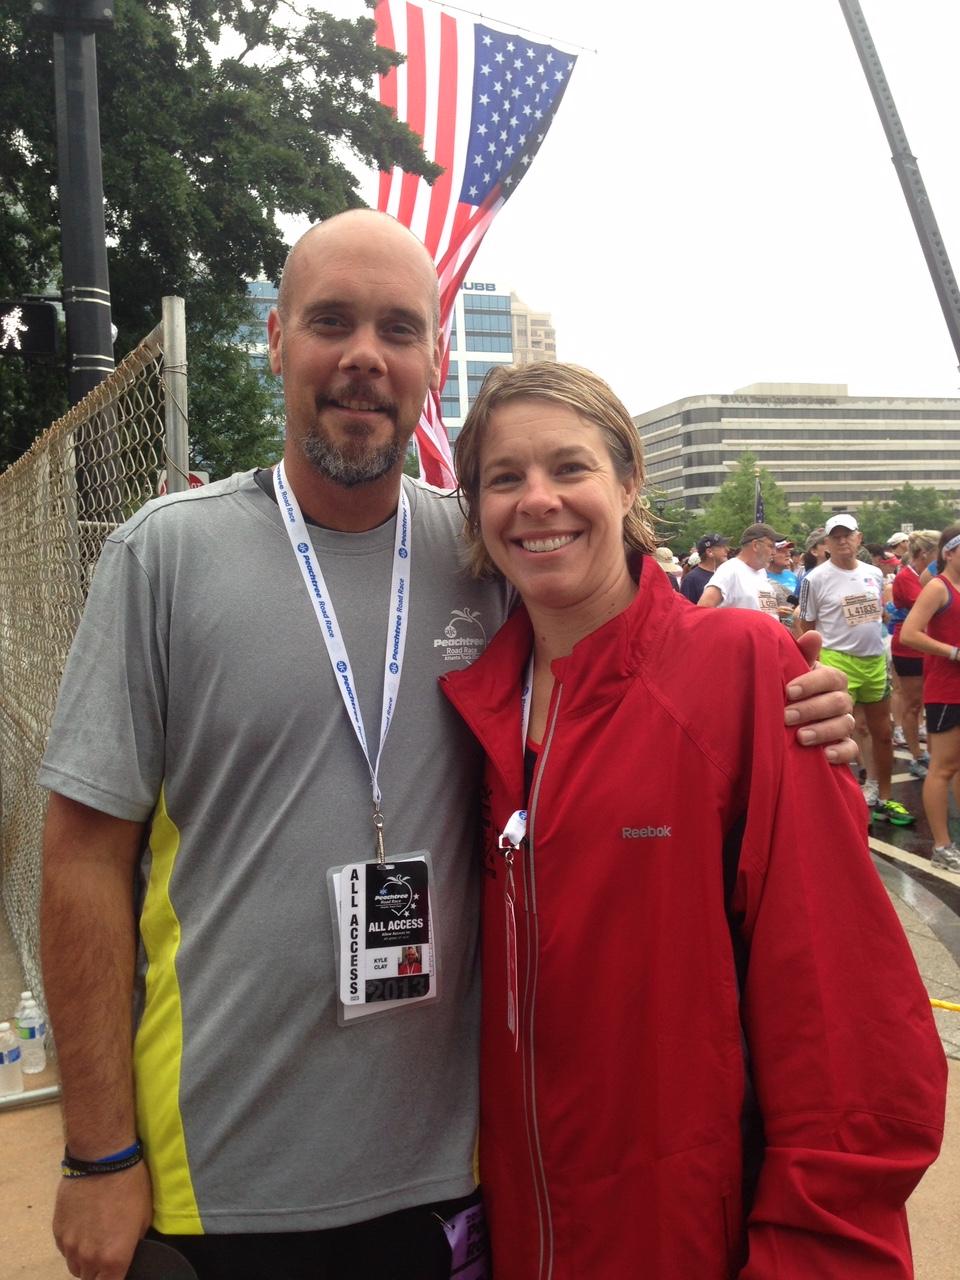 Kyle and Jill Clay